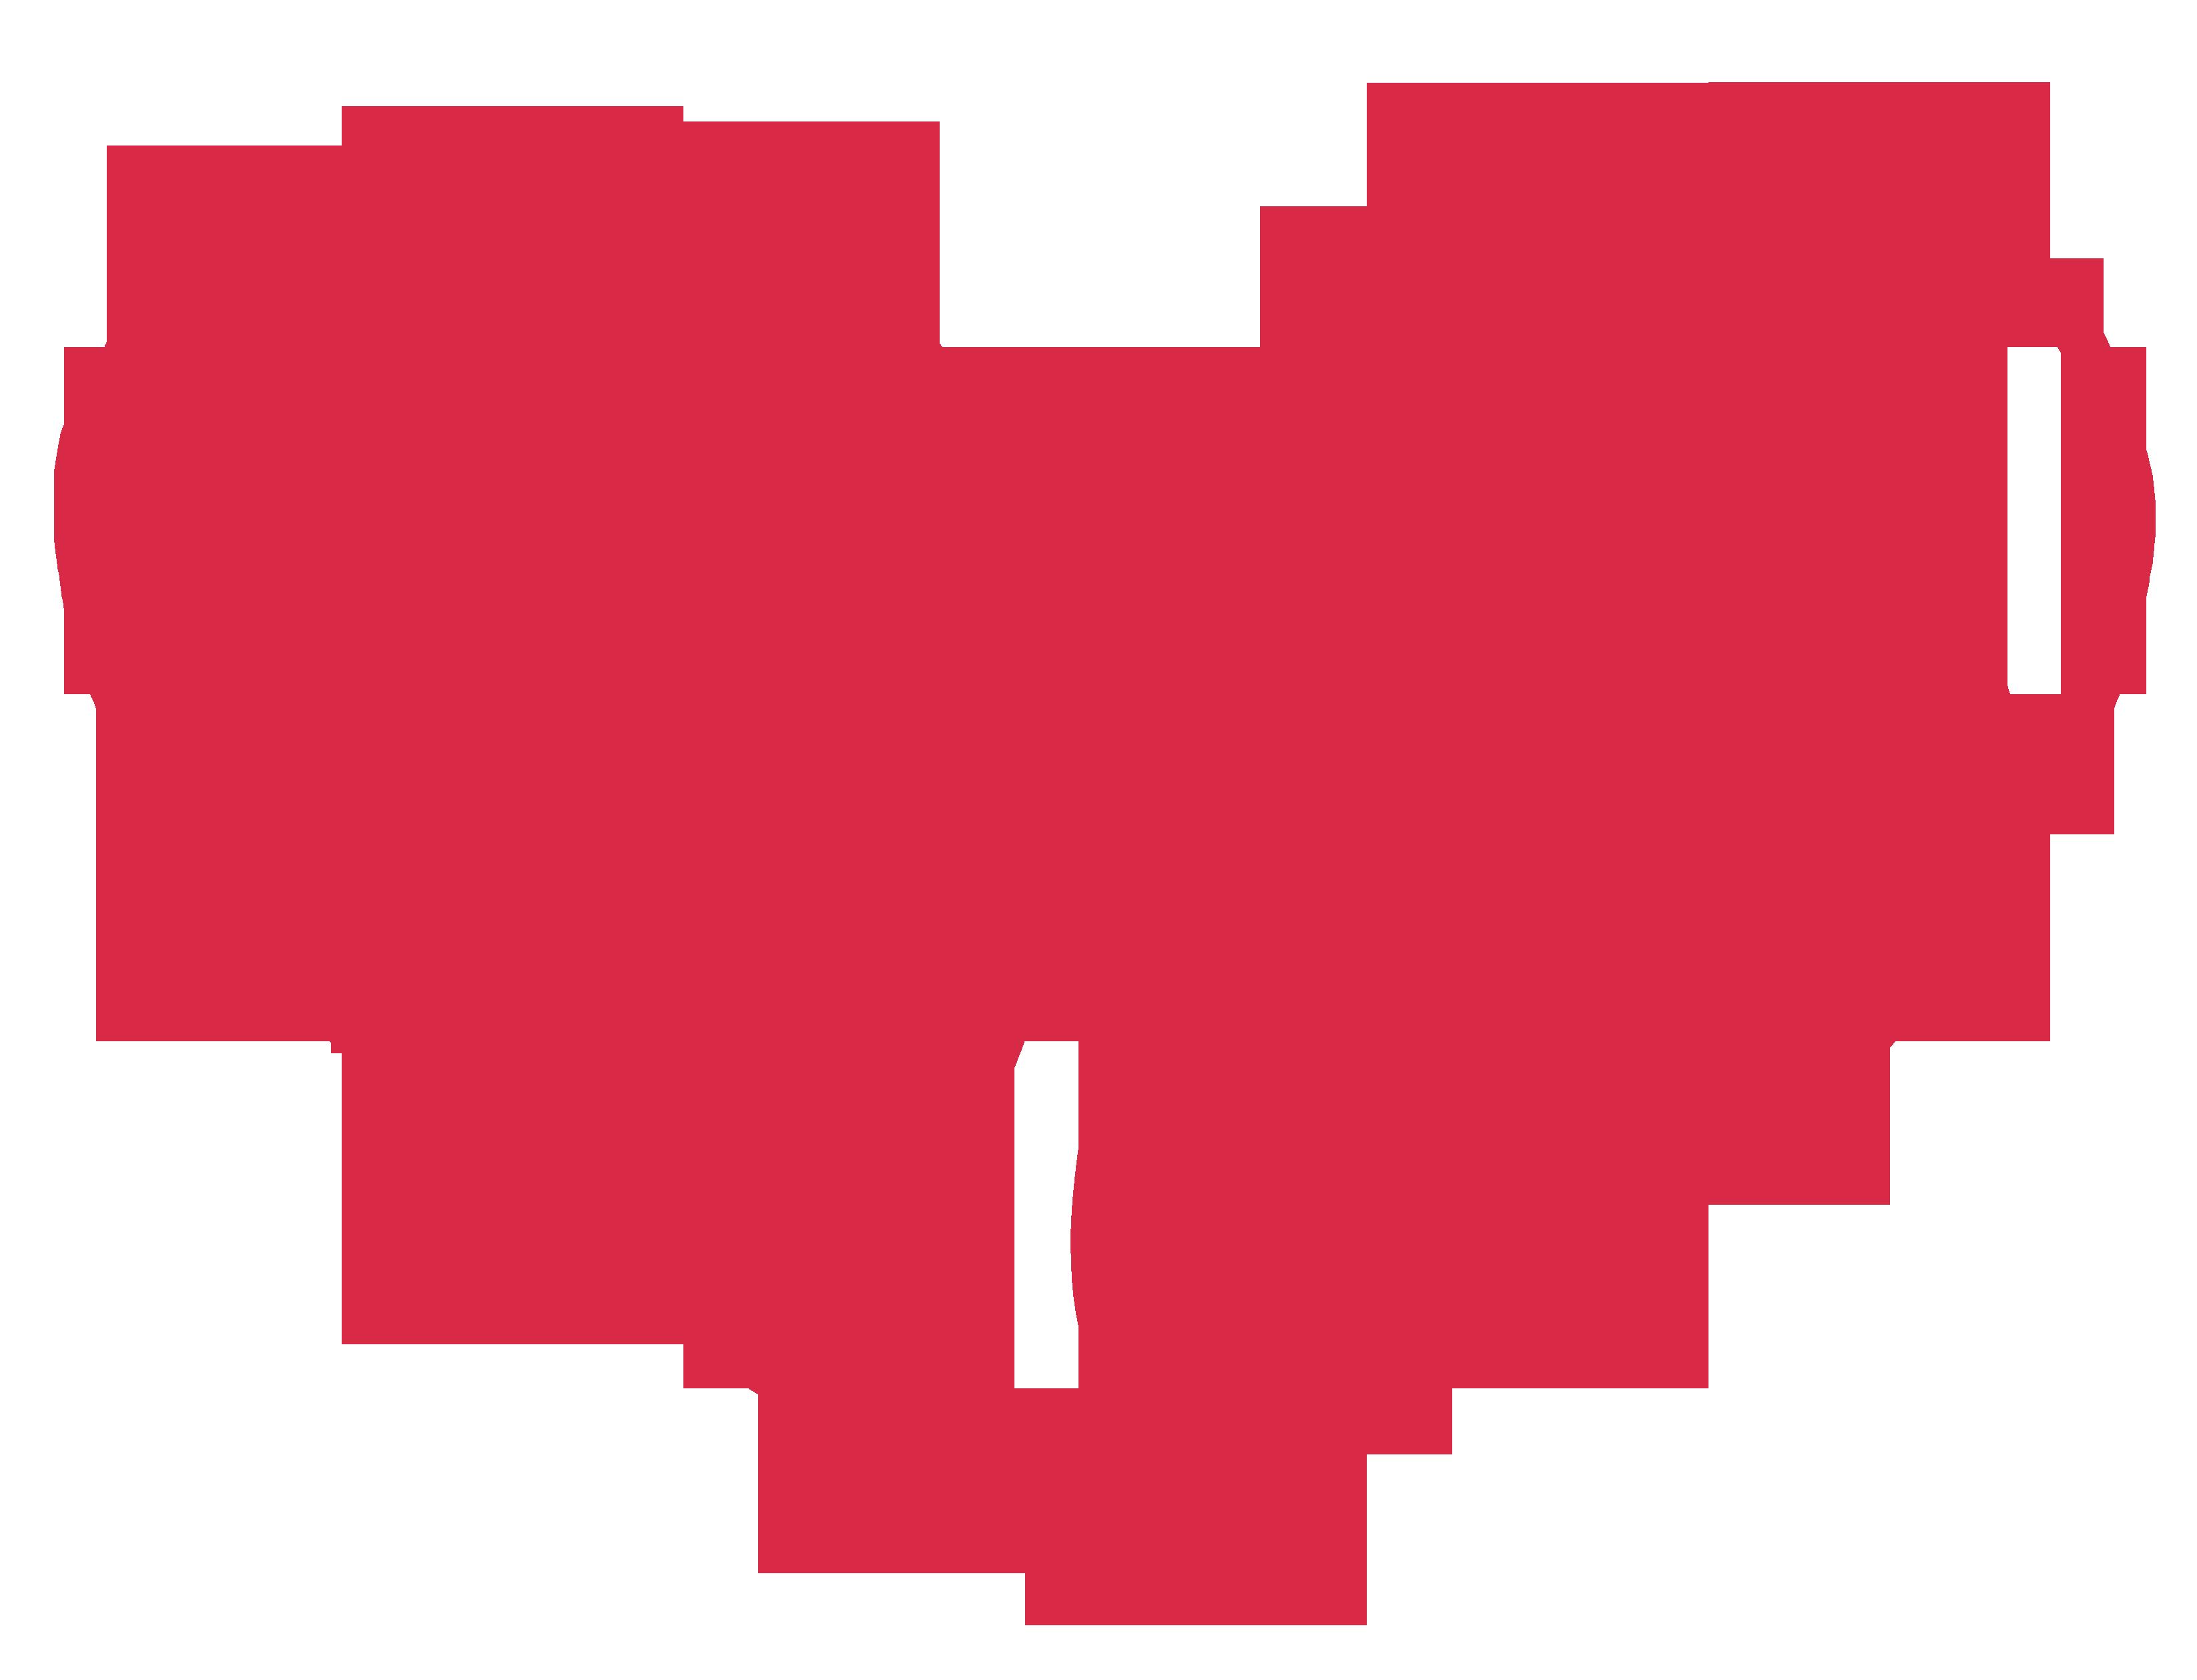 Heart-shaped clipart open heart #9